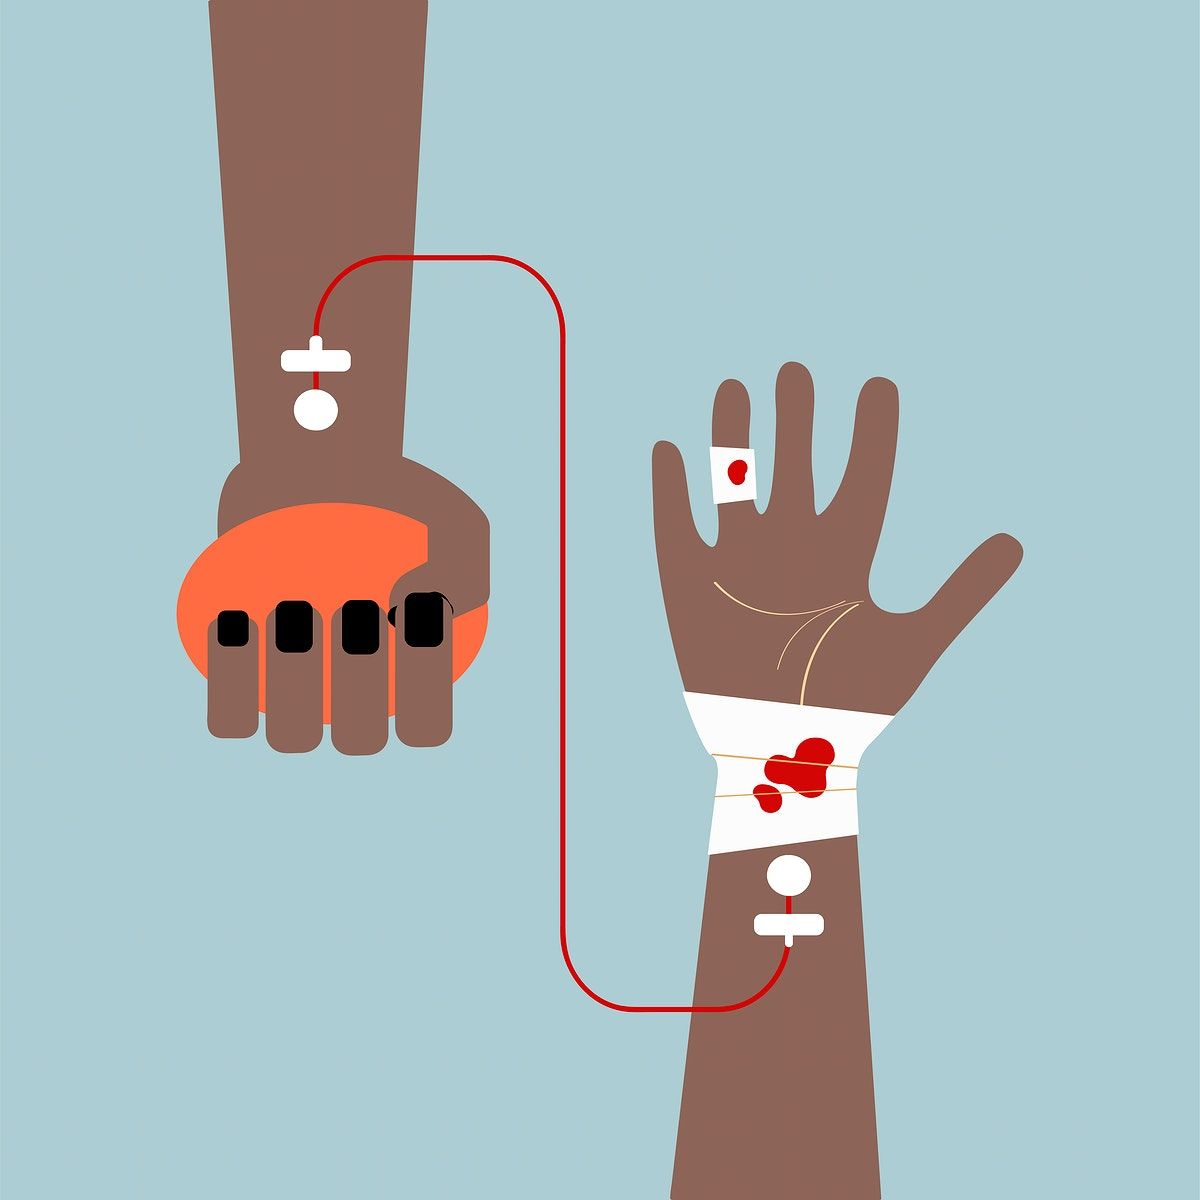 Clipart of blood transfusion vector illustration